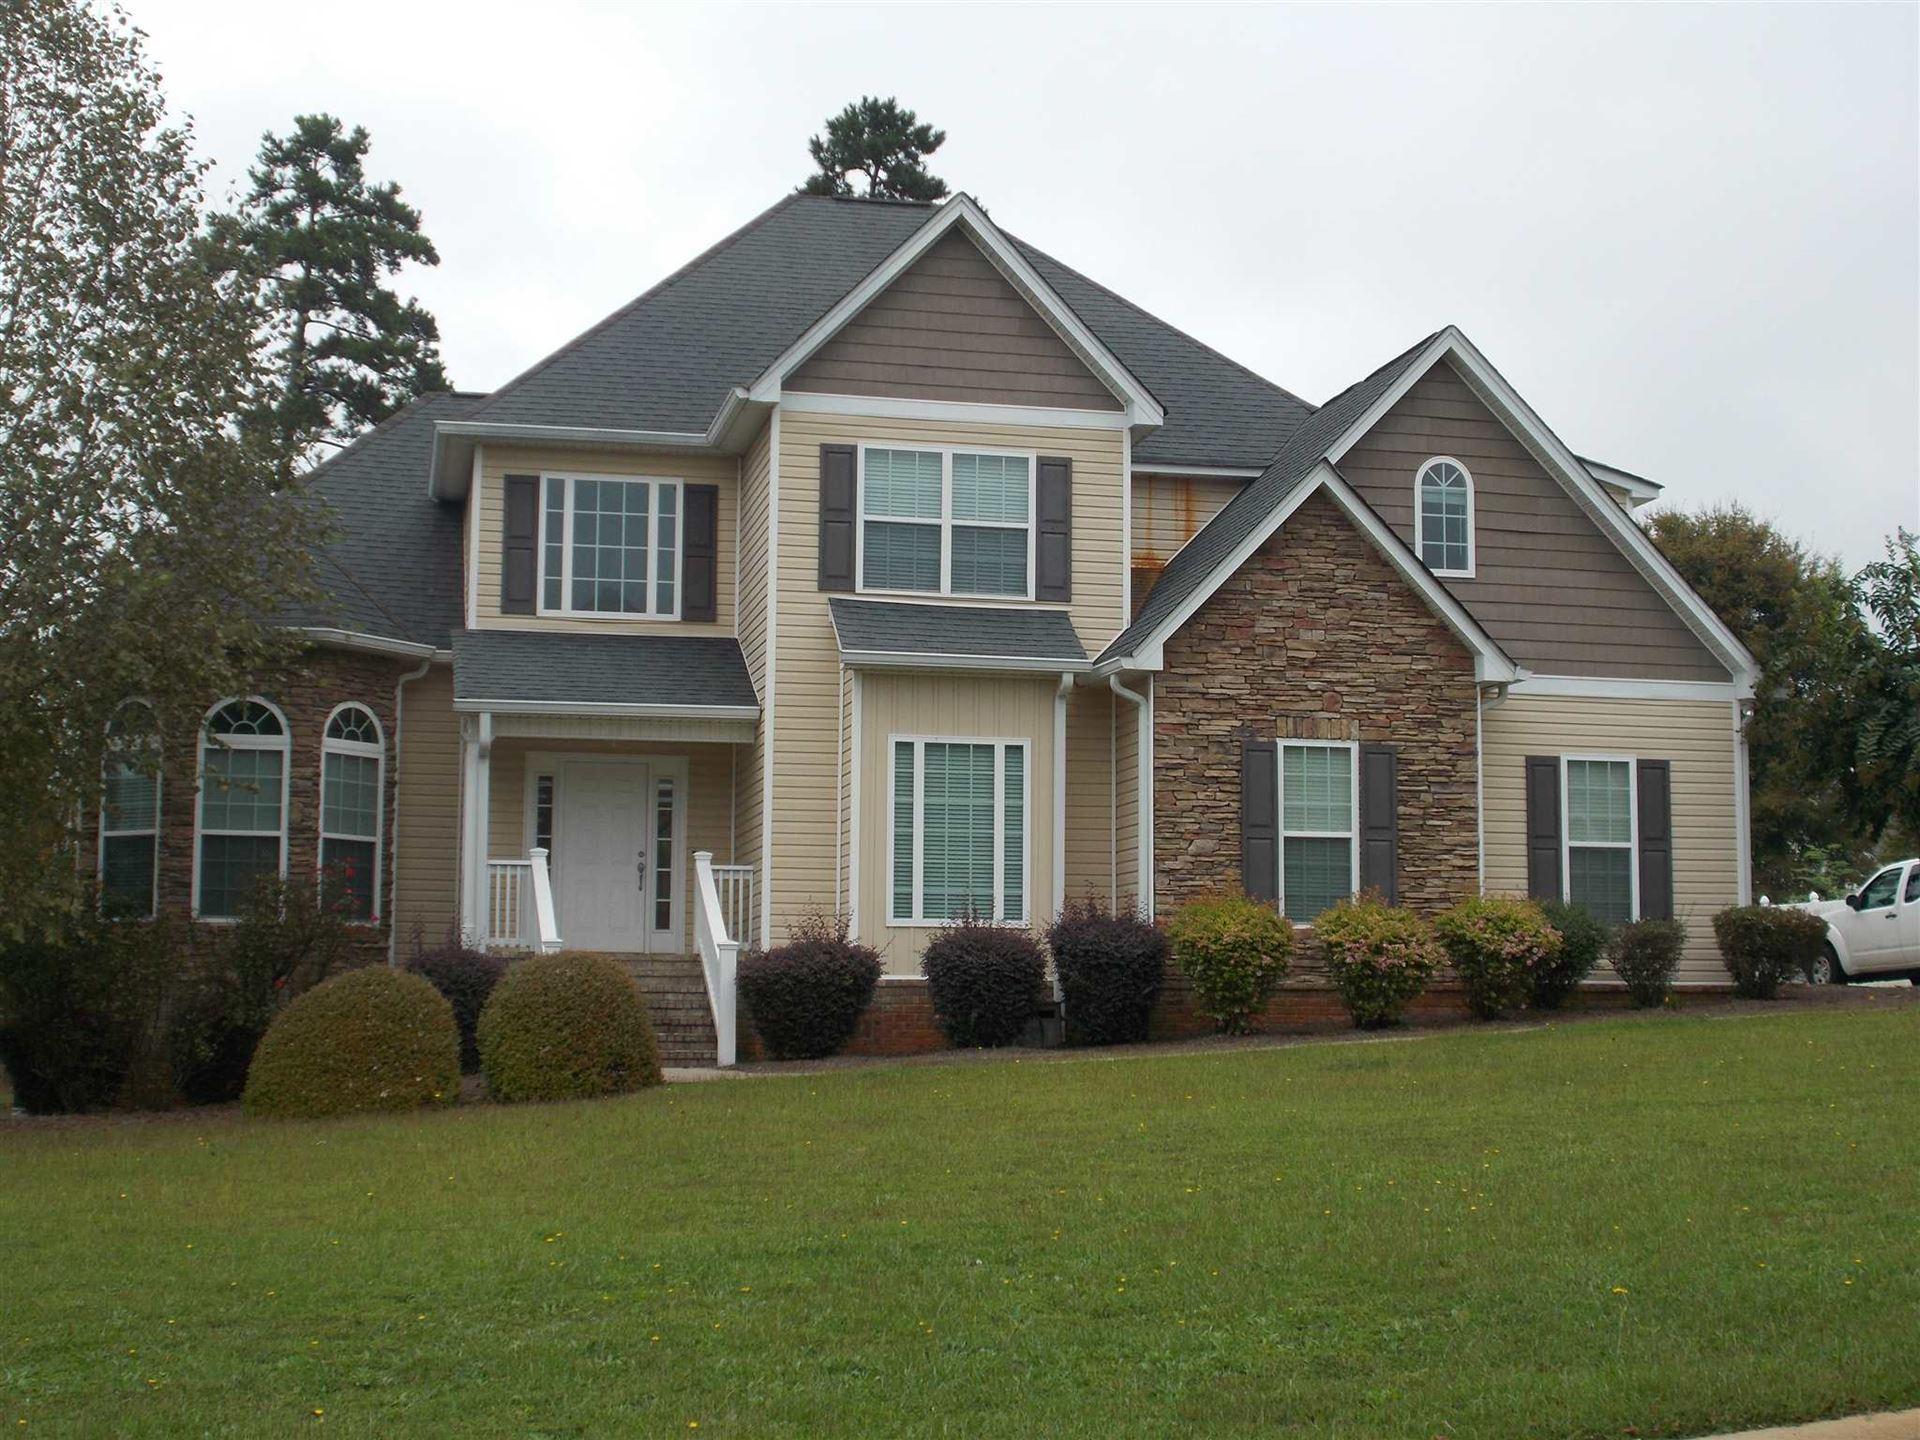 216 Will Pl, Milledgeville, GA 31061 - MLS#: 8864389